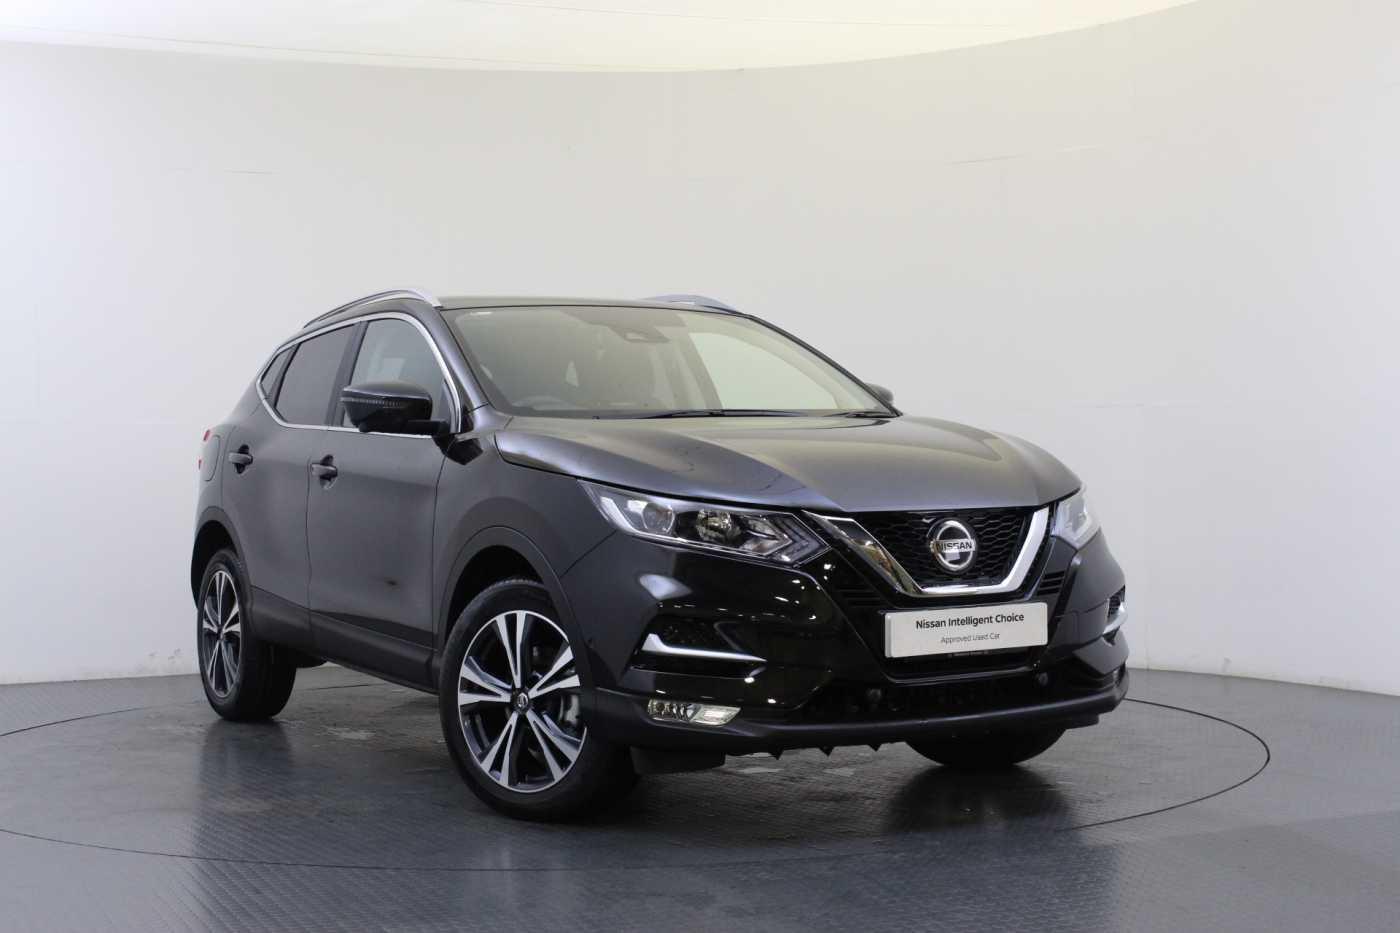 Nissan Qashqai │Black│for Sale in Edinburgh│Nissan Used ...